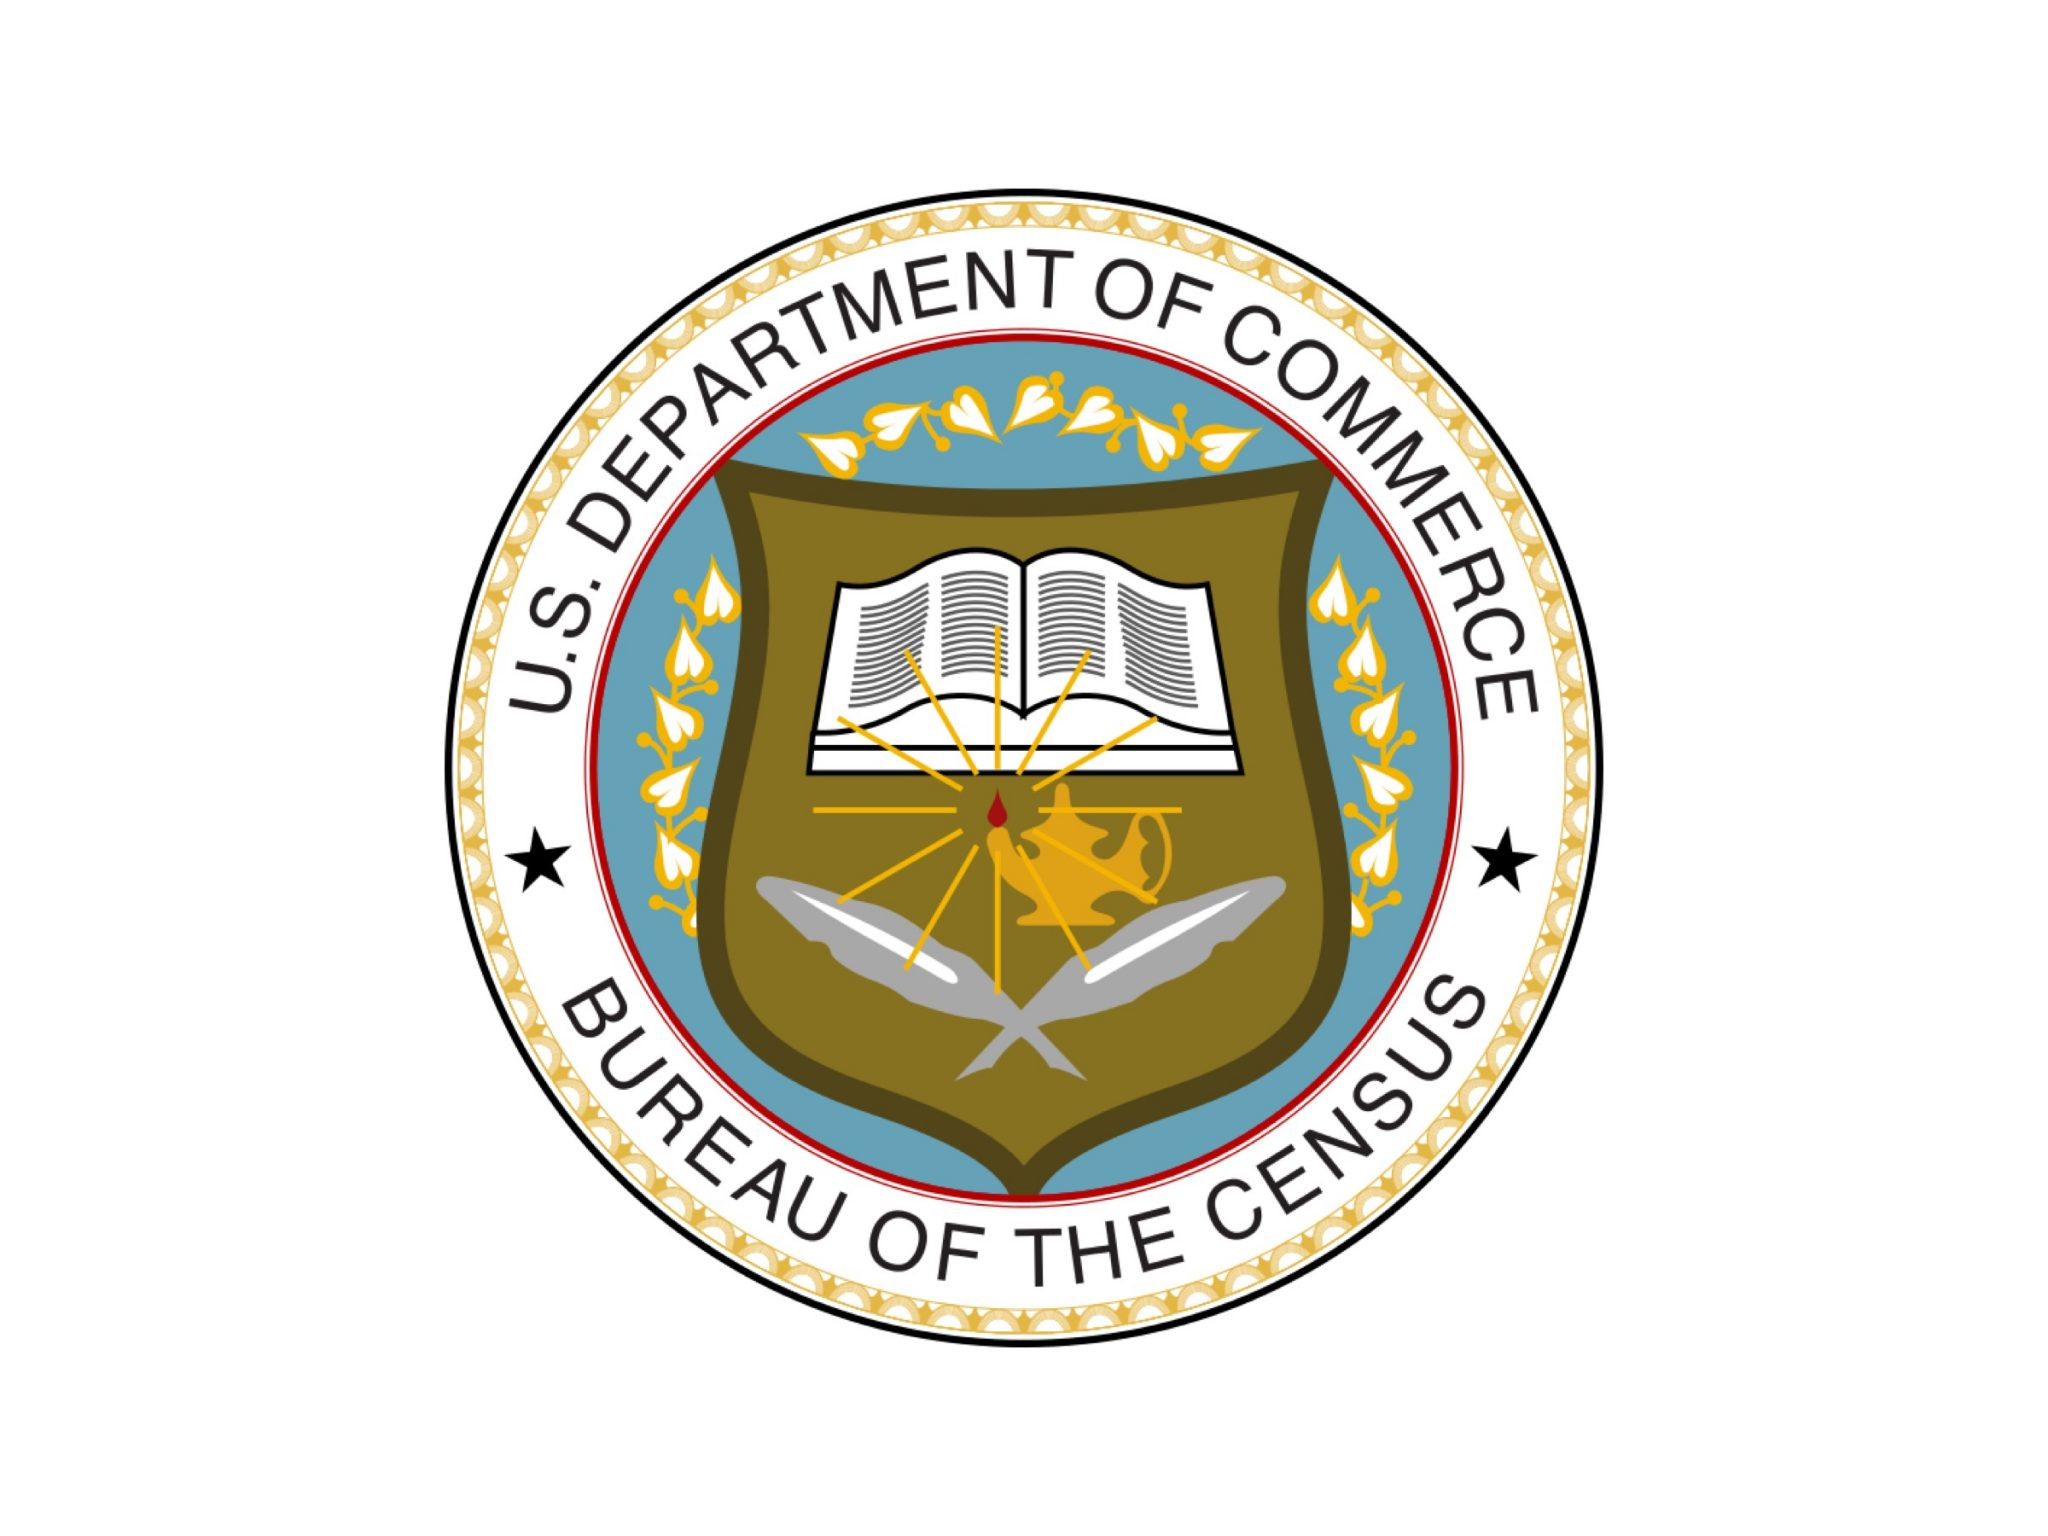 New York To Take On U.S. Census Bureau